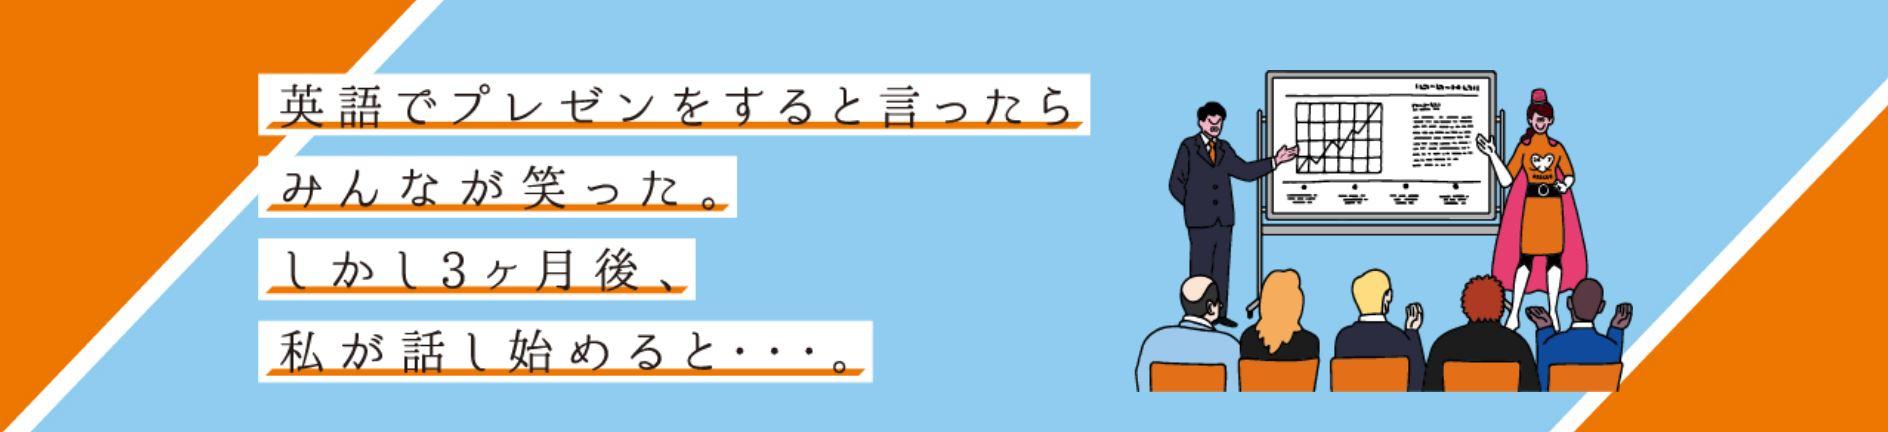 4.24/7 English